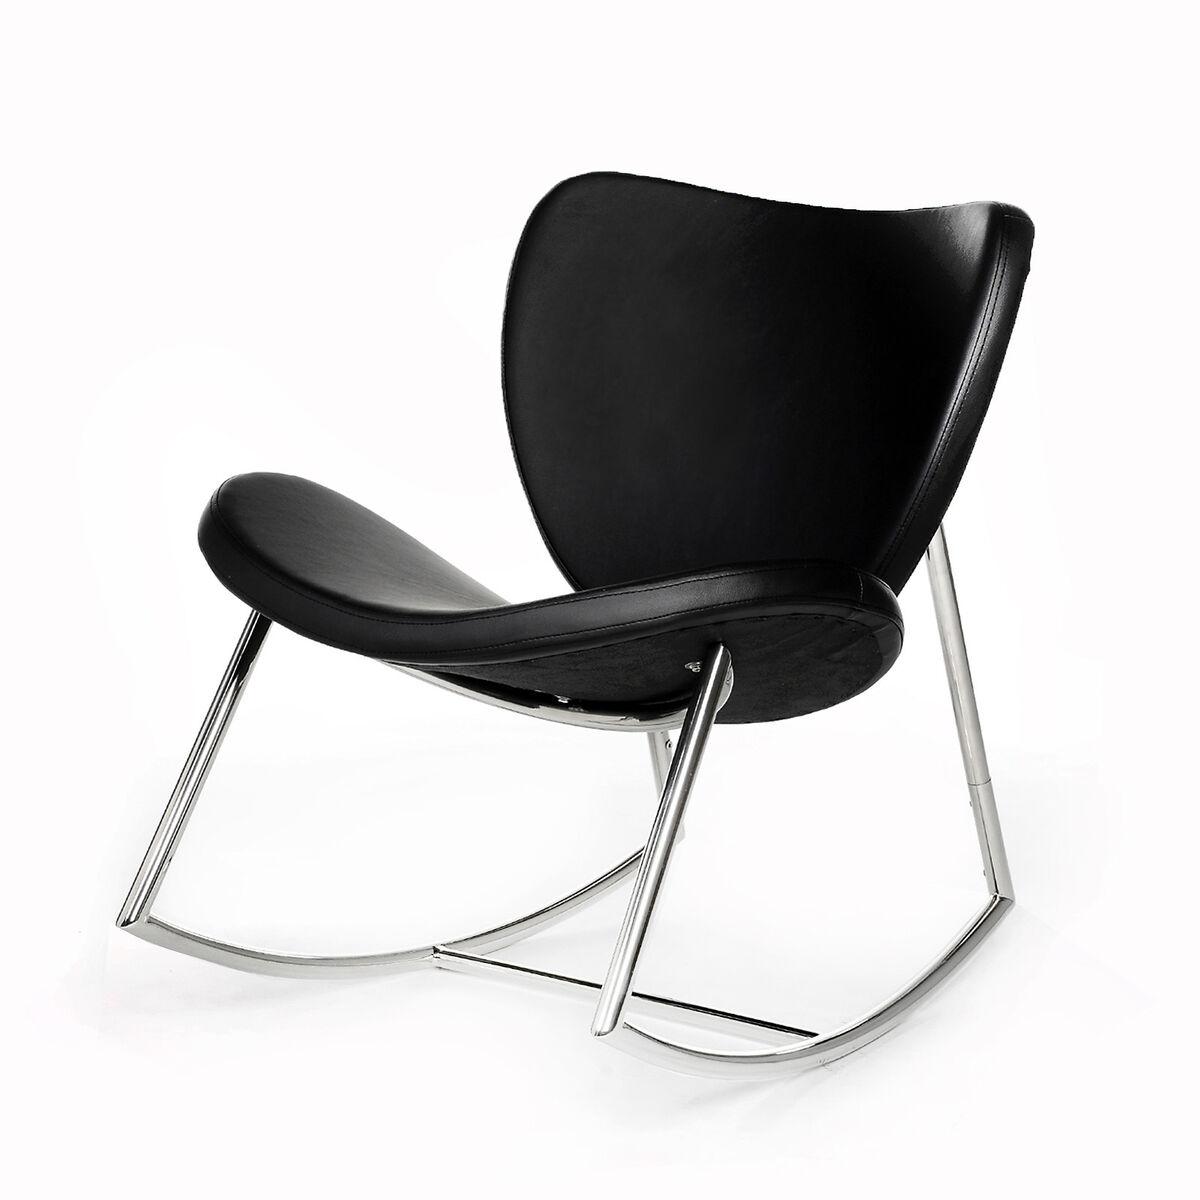 schaukelstuhl ca 66x74x80cm schwarz depot de. Black Bedroom Furniture Sets. Home Design Ideas